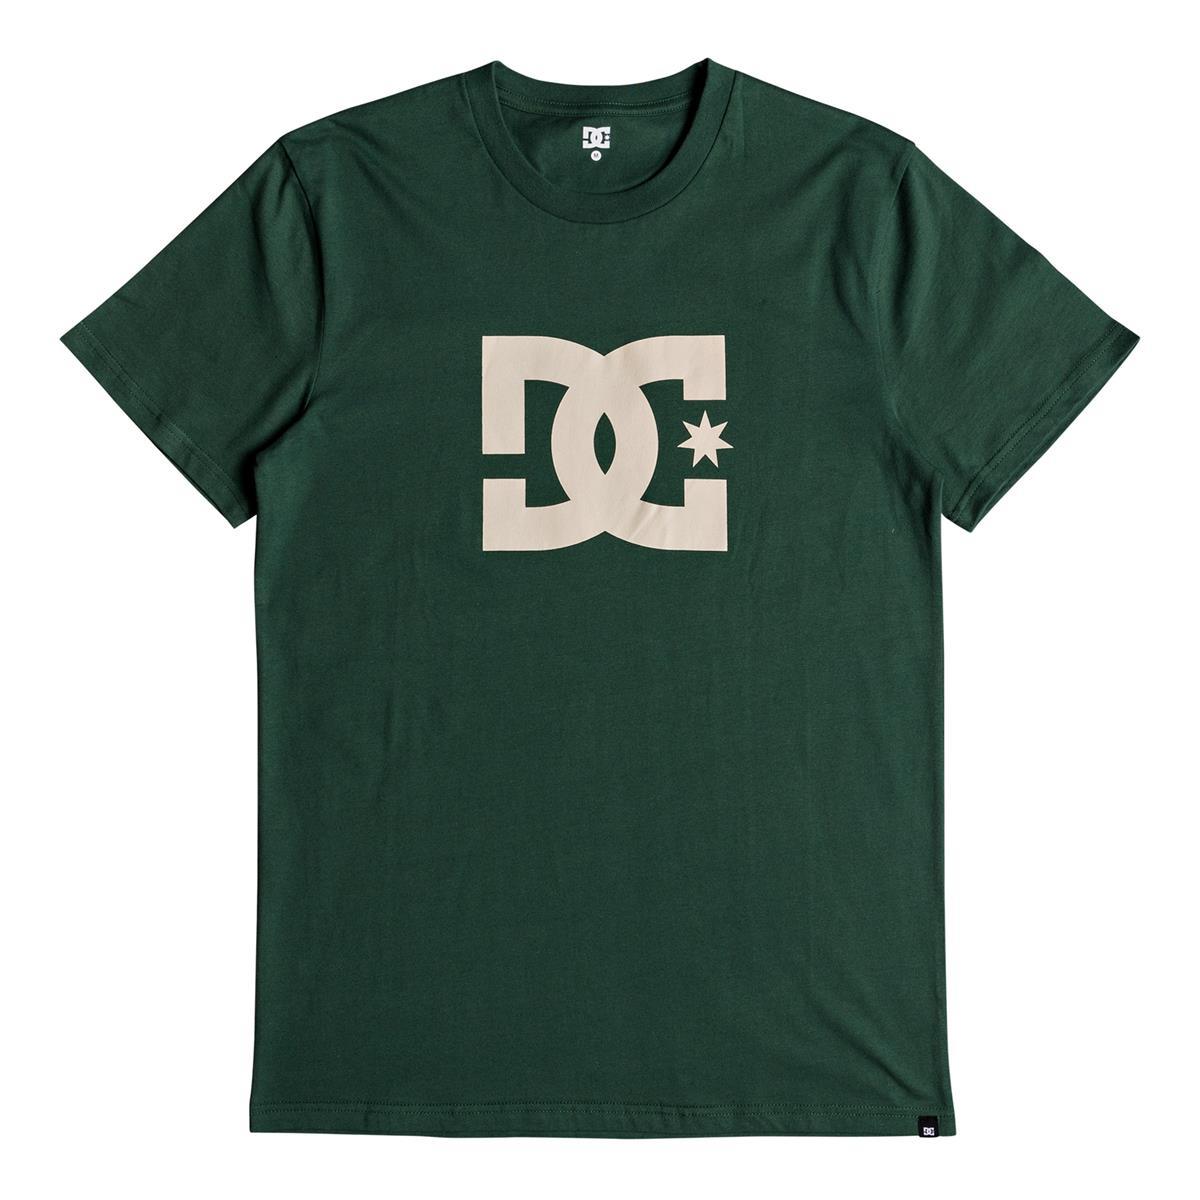 DC T-Shirt Star Hunter Green